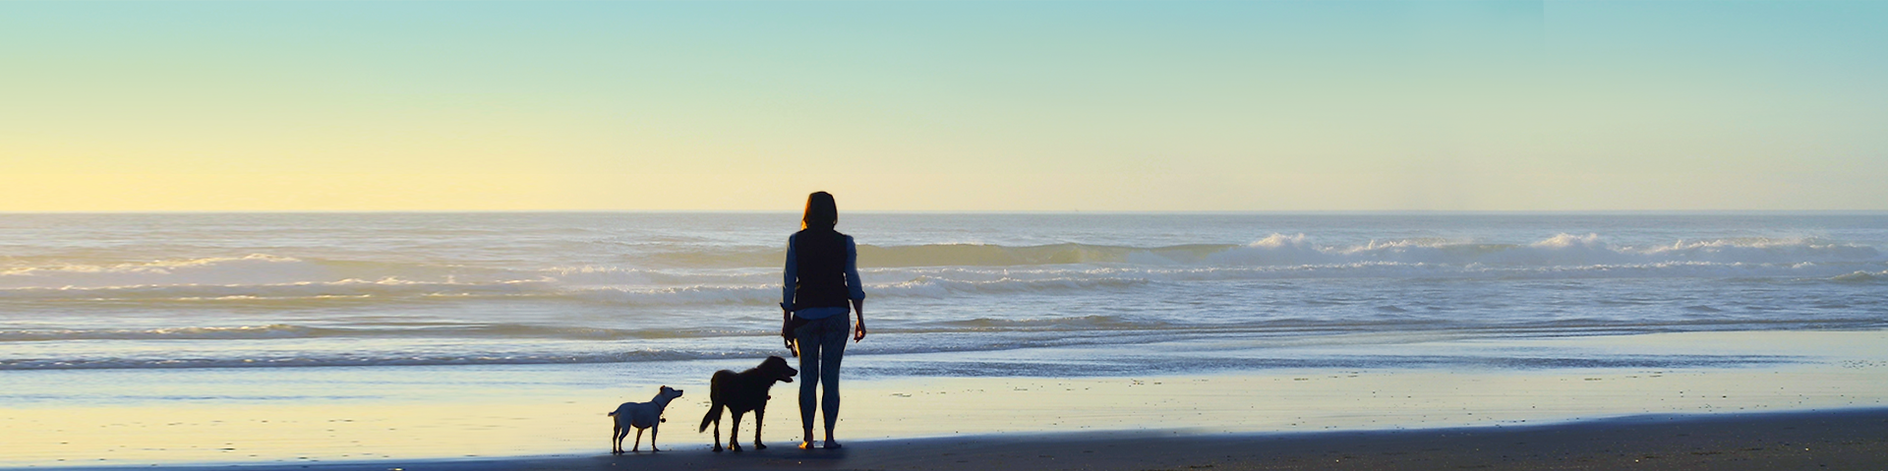 Tail Traveler - Oregon Coast